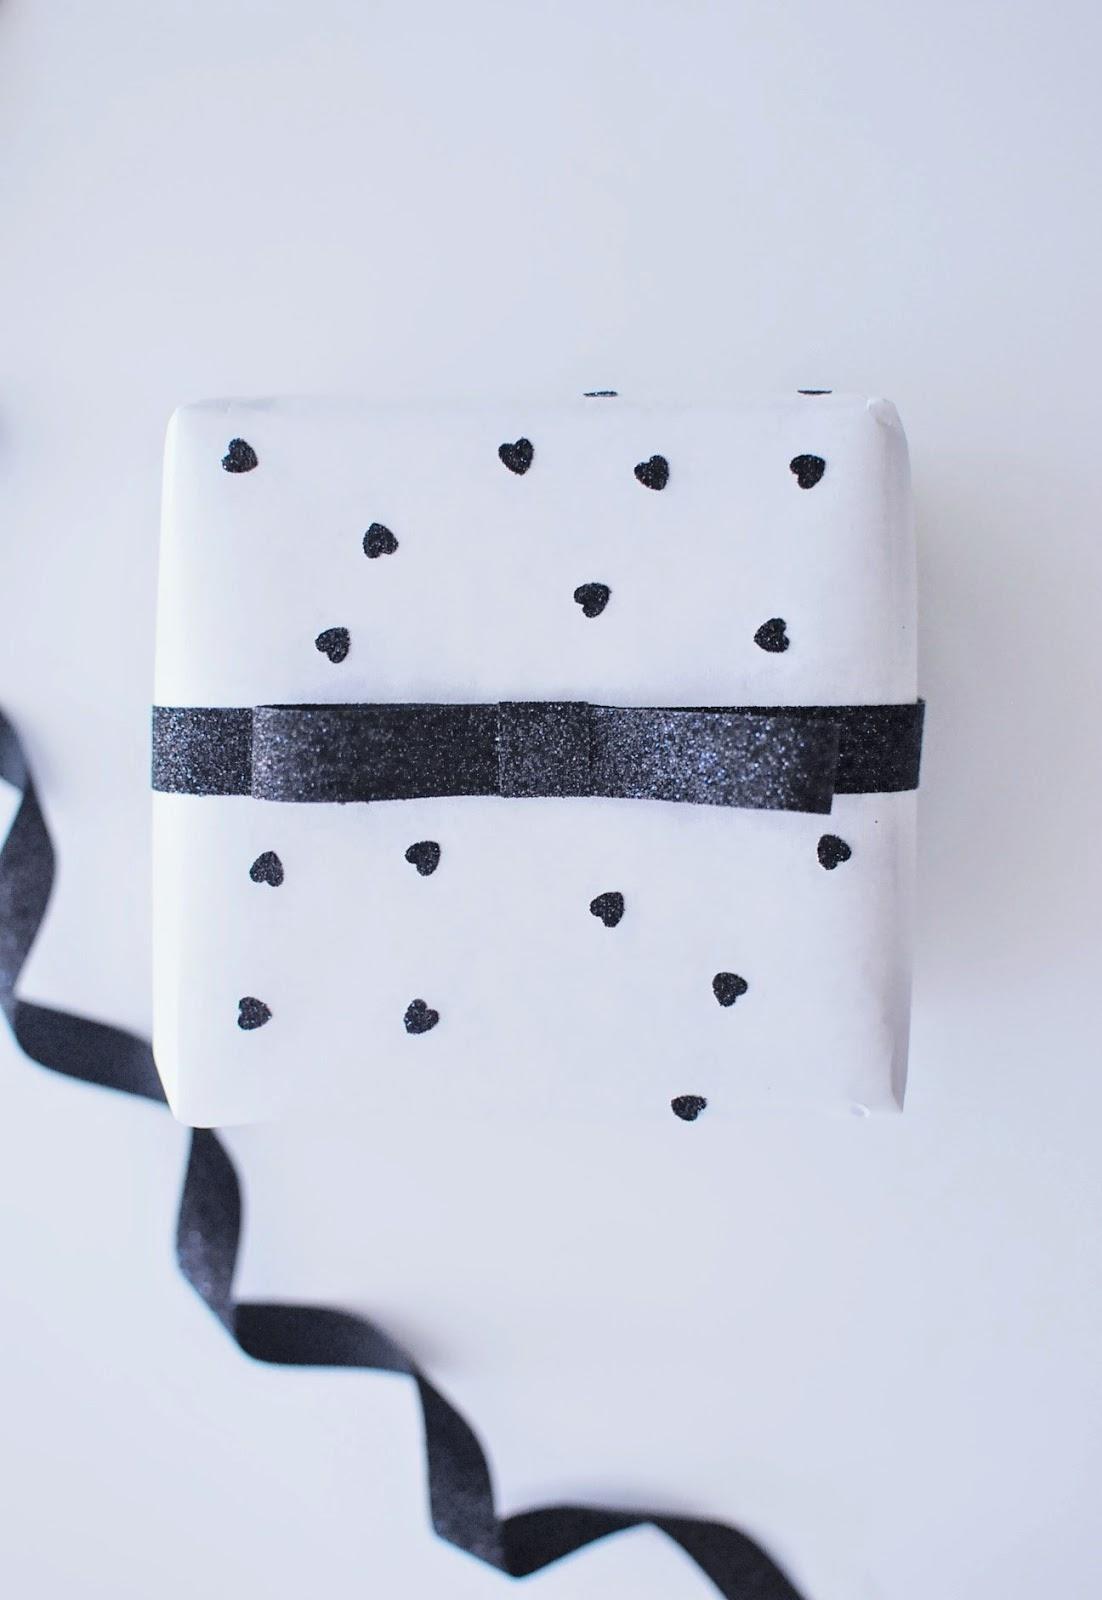 http://4.bp.blogspot.com/-wGUNw0S0TIg/VHOOM2AYgbI/AAAAAAAANtA/zPULdy7i9-E/s1600/diy_wrapping_paper_heart.JPG